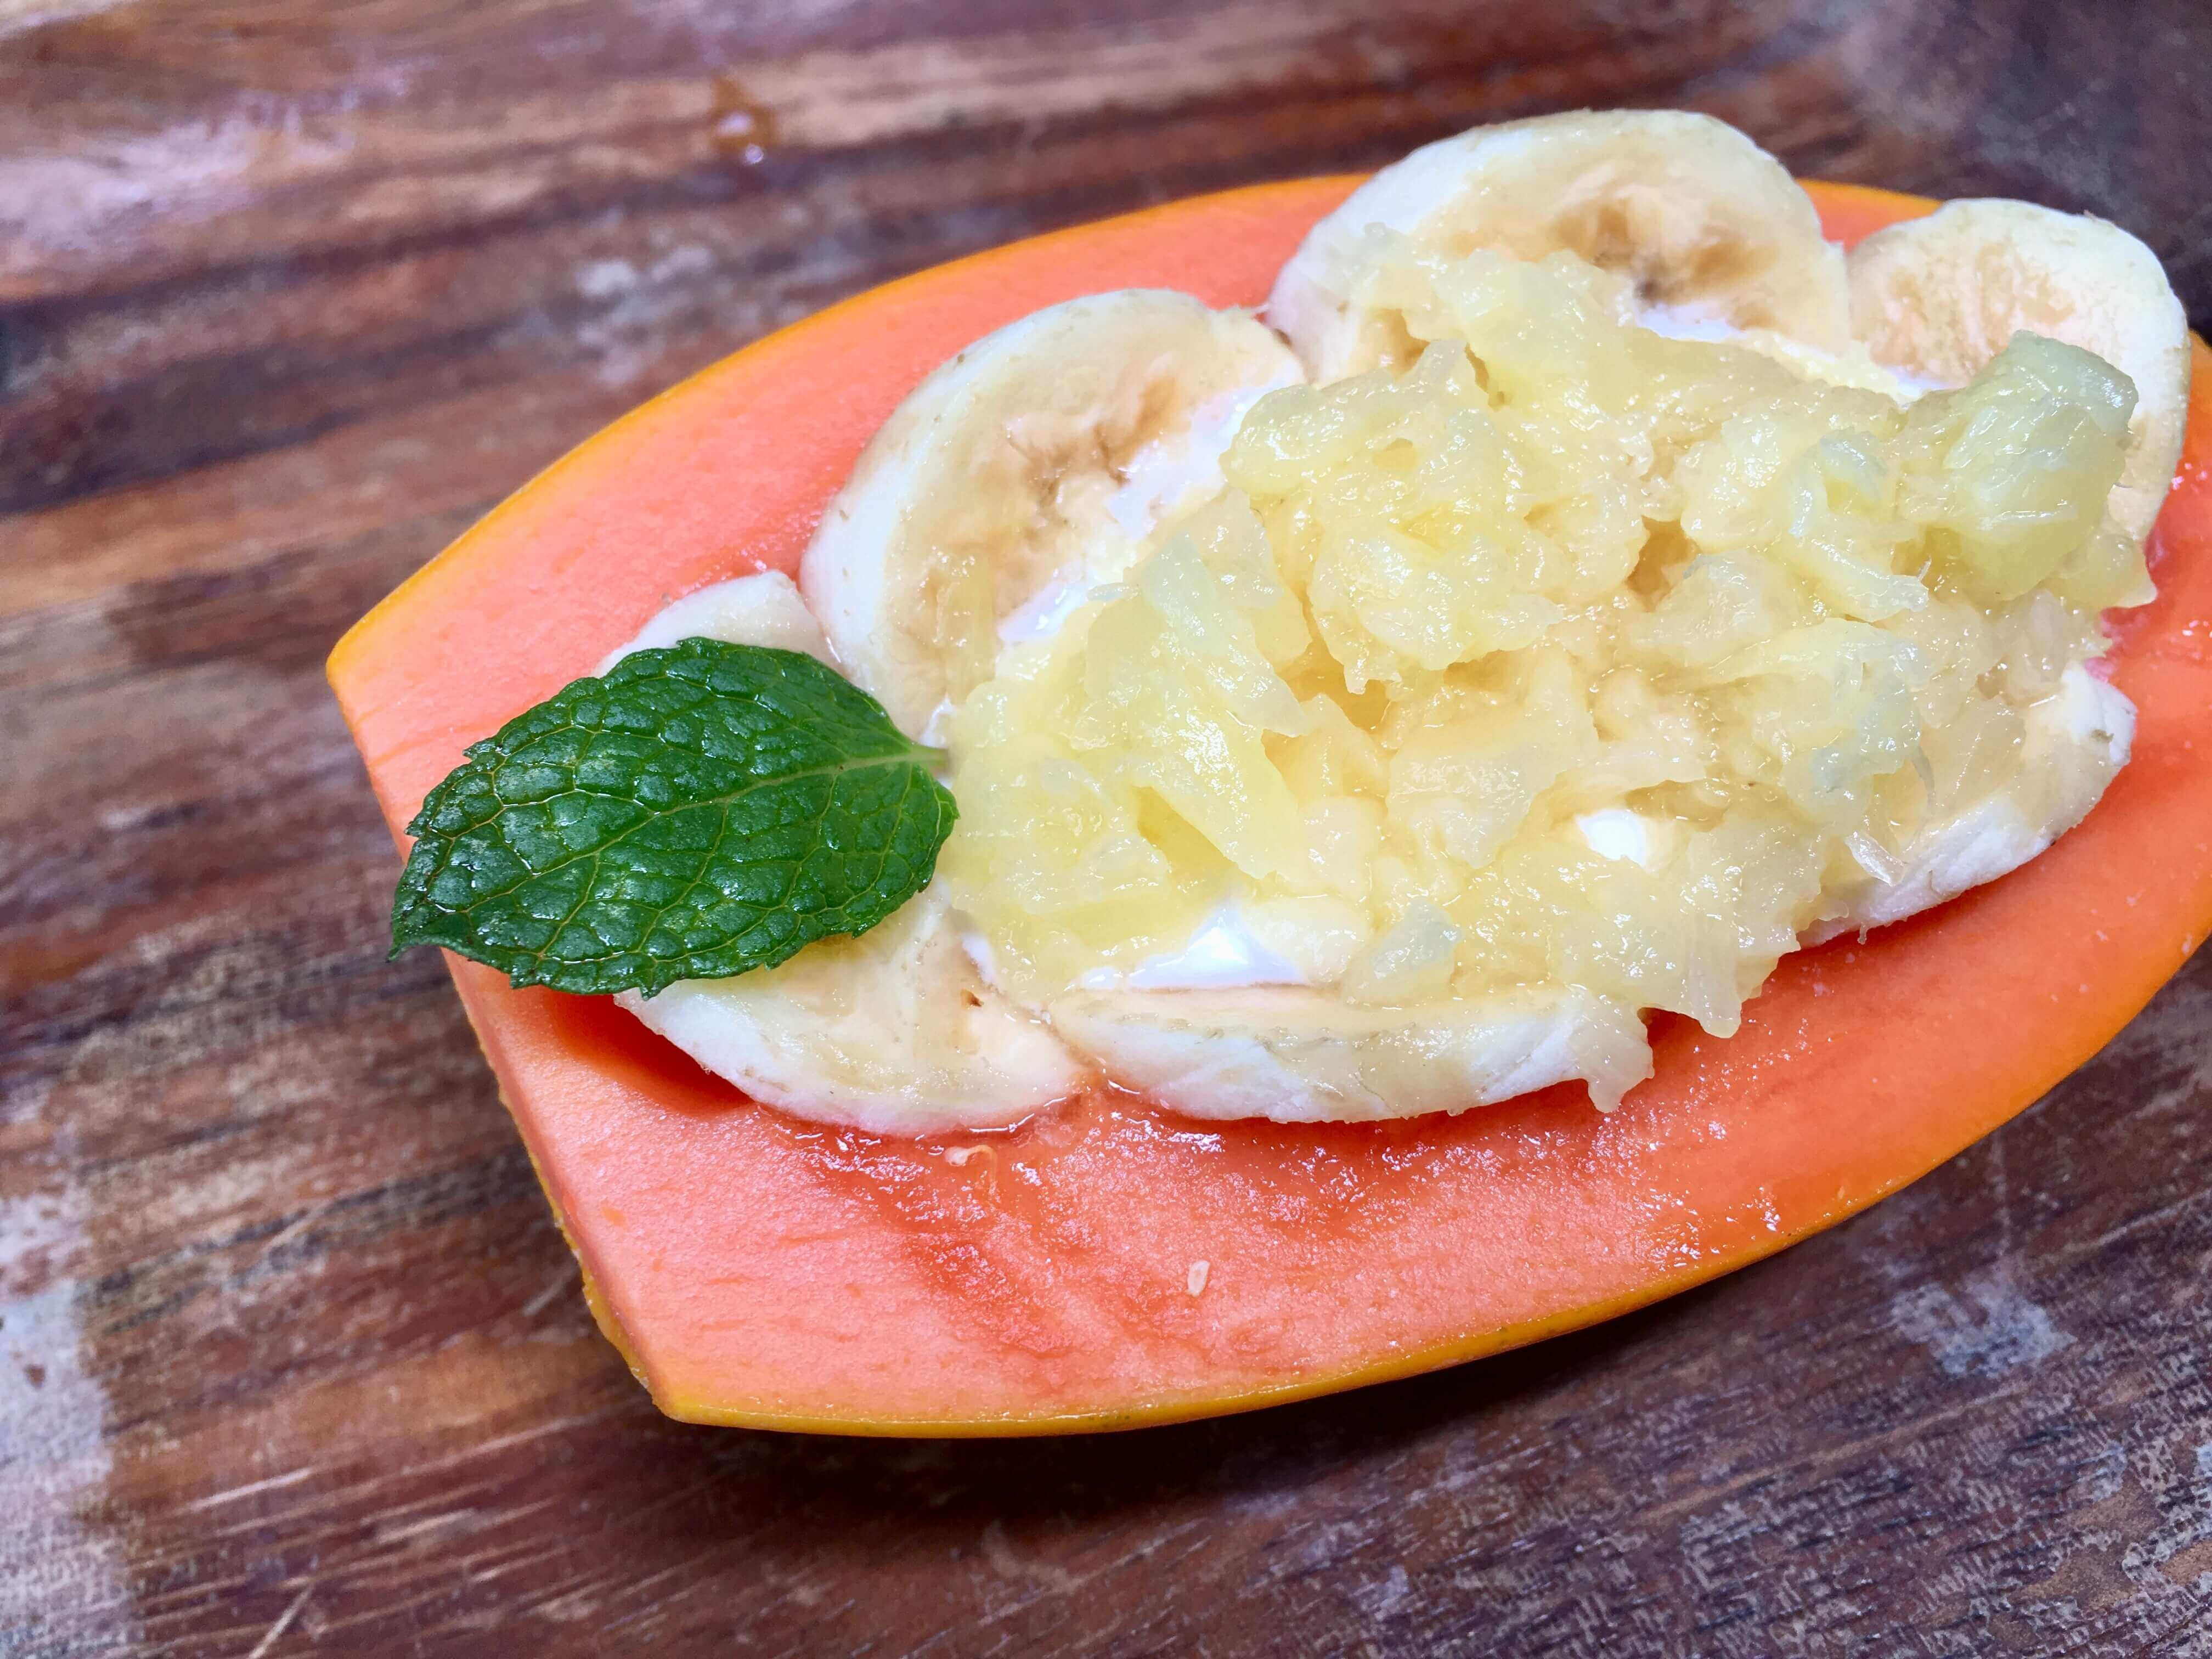 Hotels in volcano - volcano inn - complimentary breakfast - papaya bowls